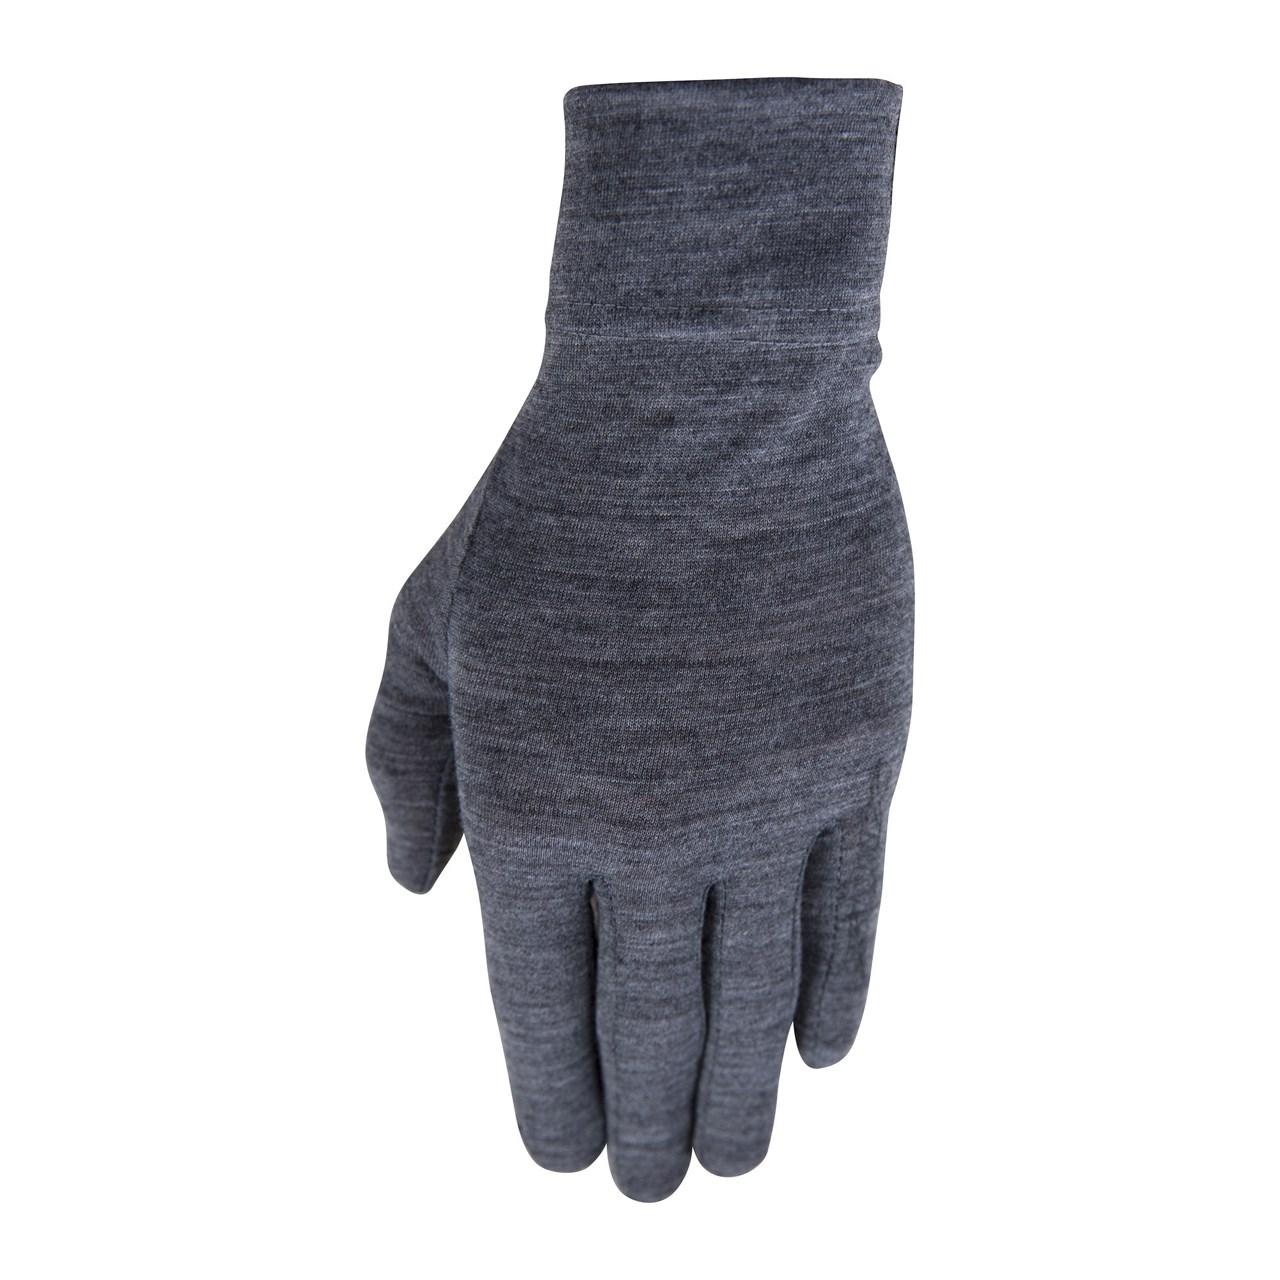 Swix Endure liner glove